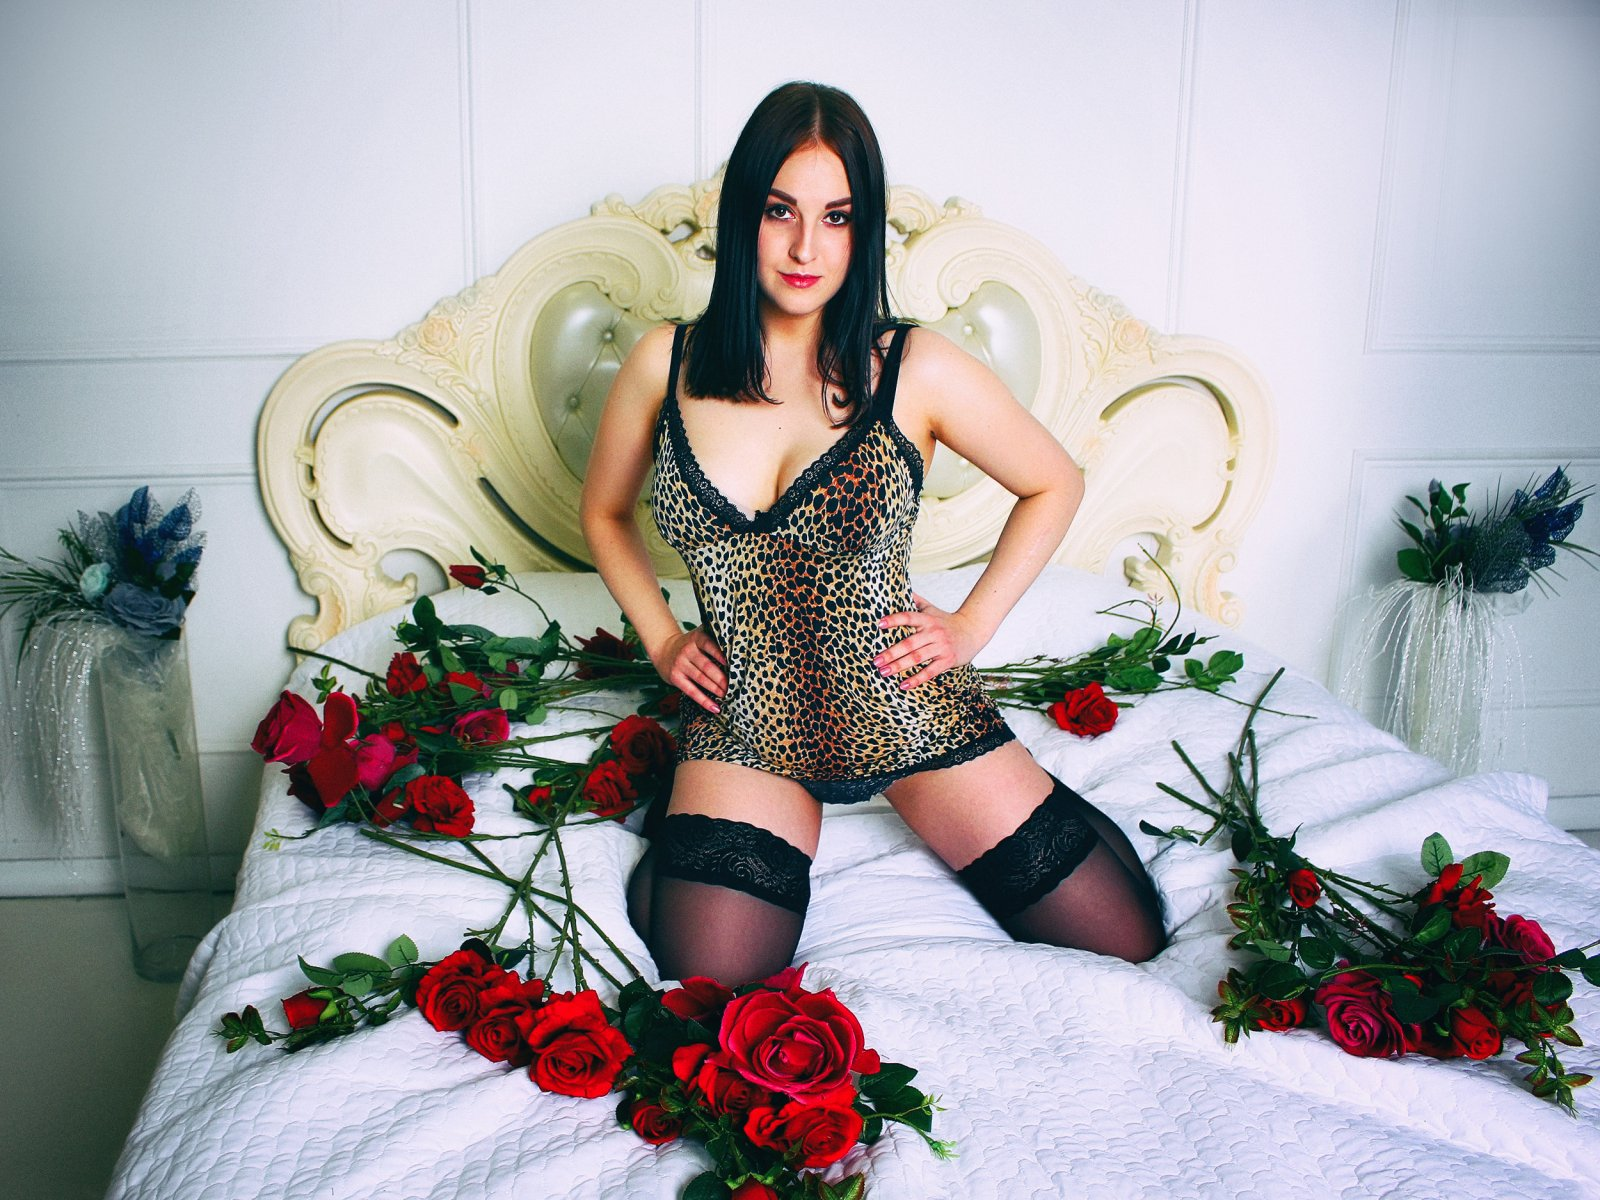 Queen cute sex live webcam